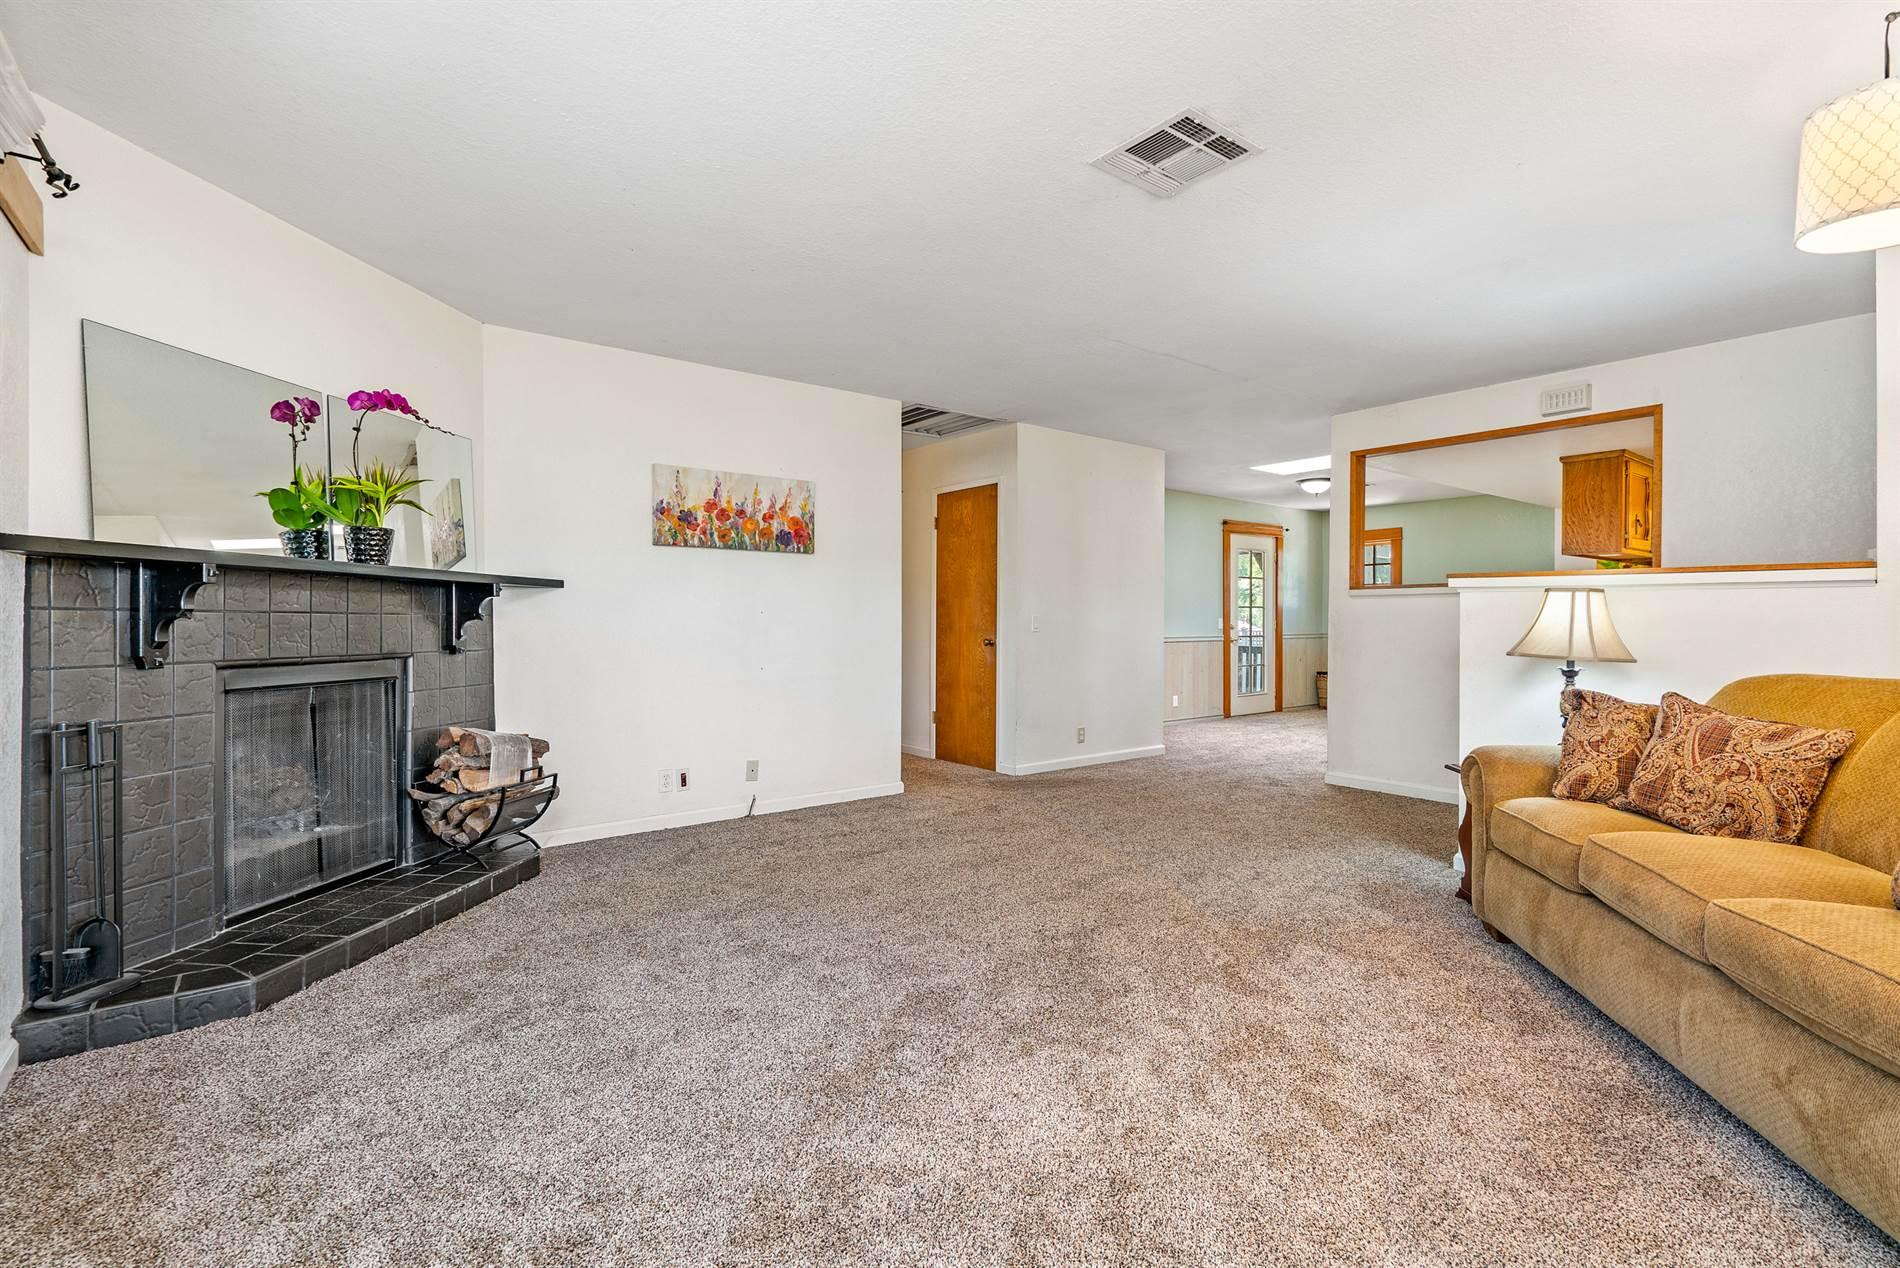 7287 Santa Ysabel Avenue, Atascadero, CA 93422